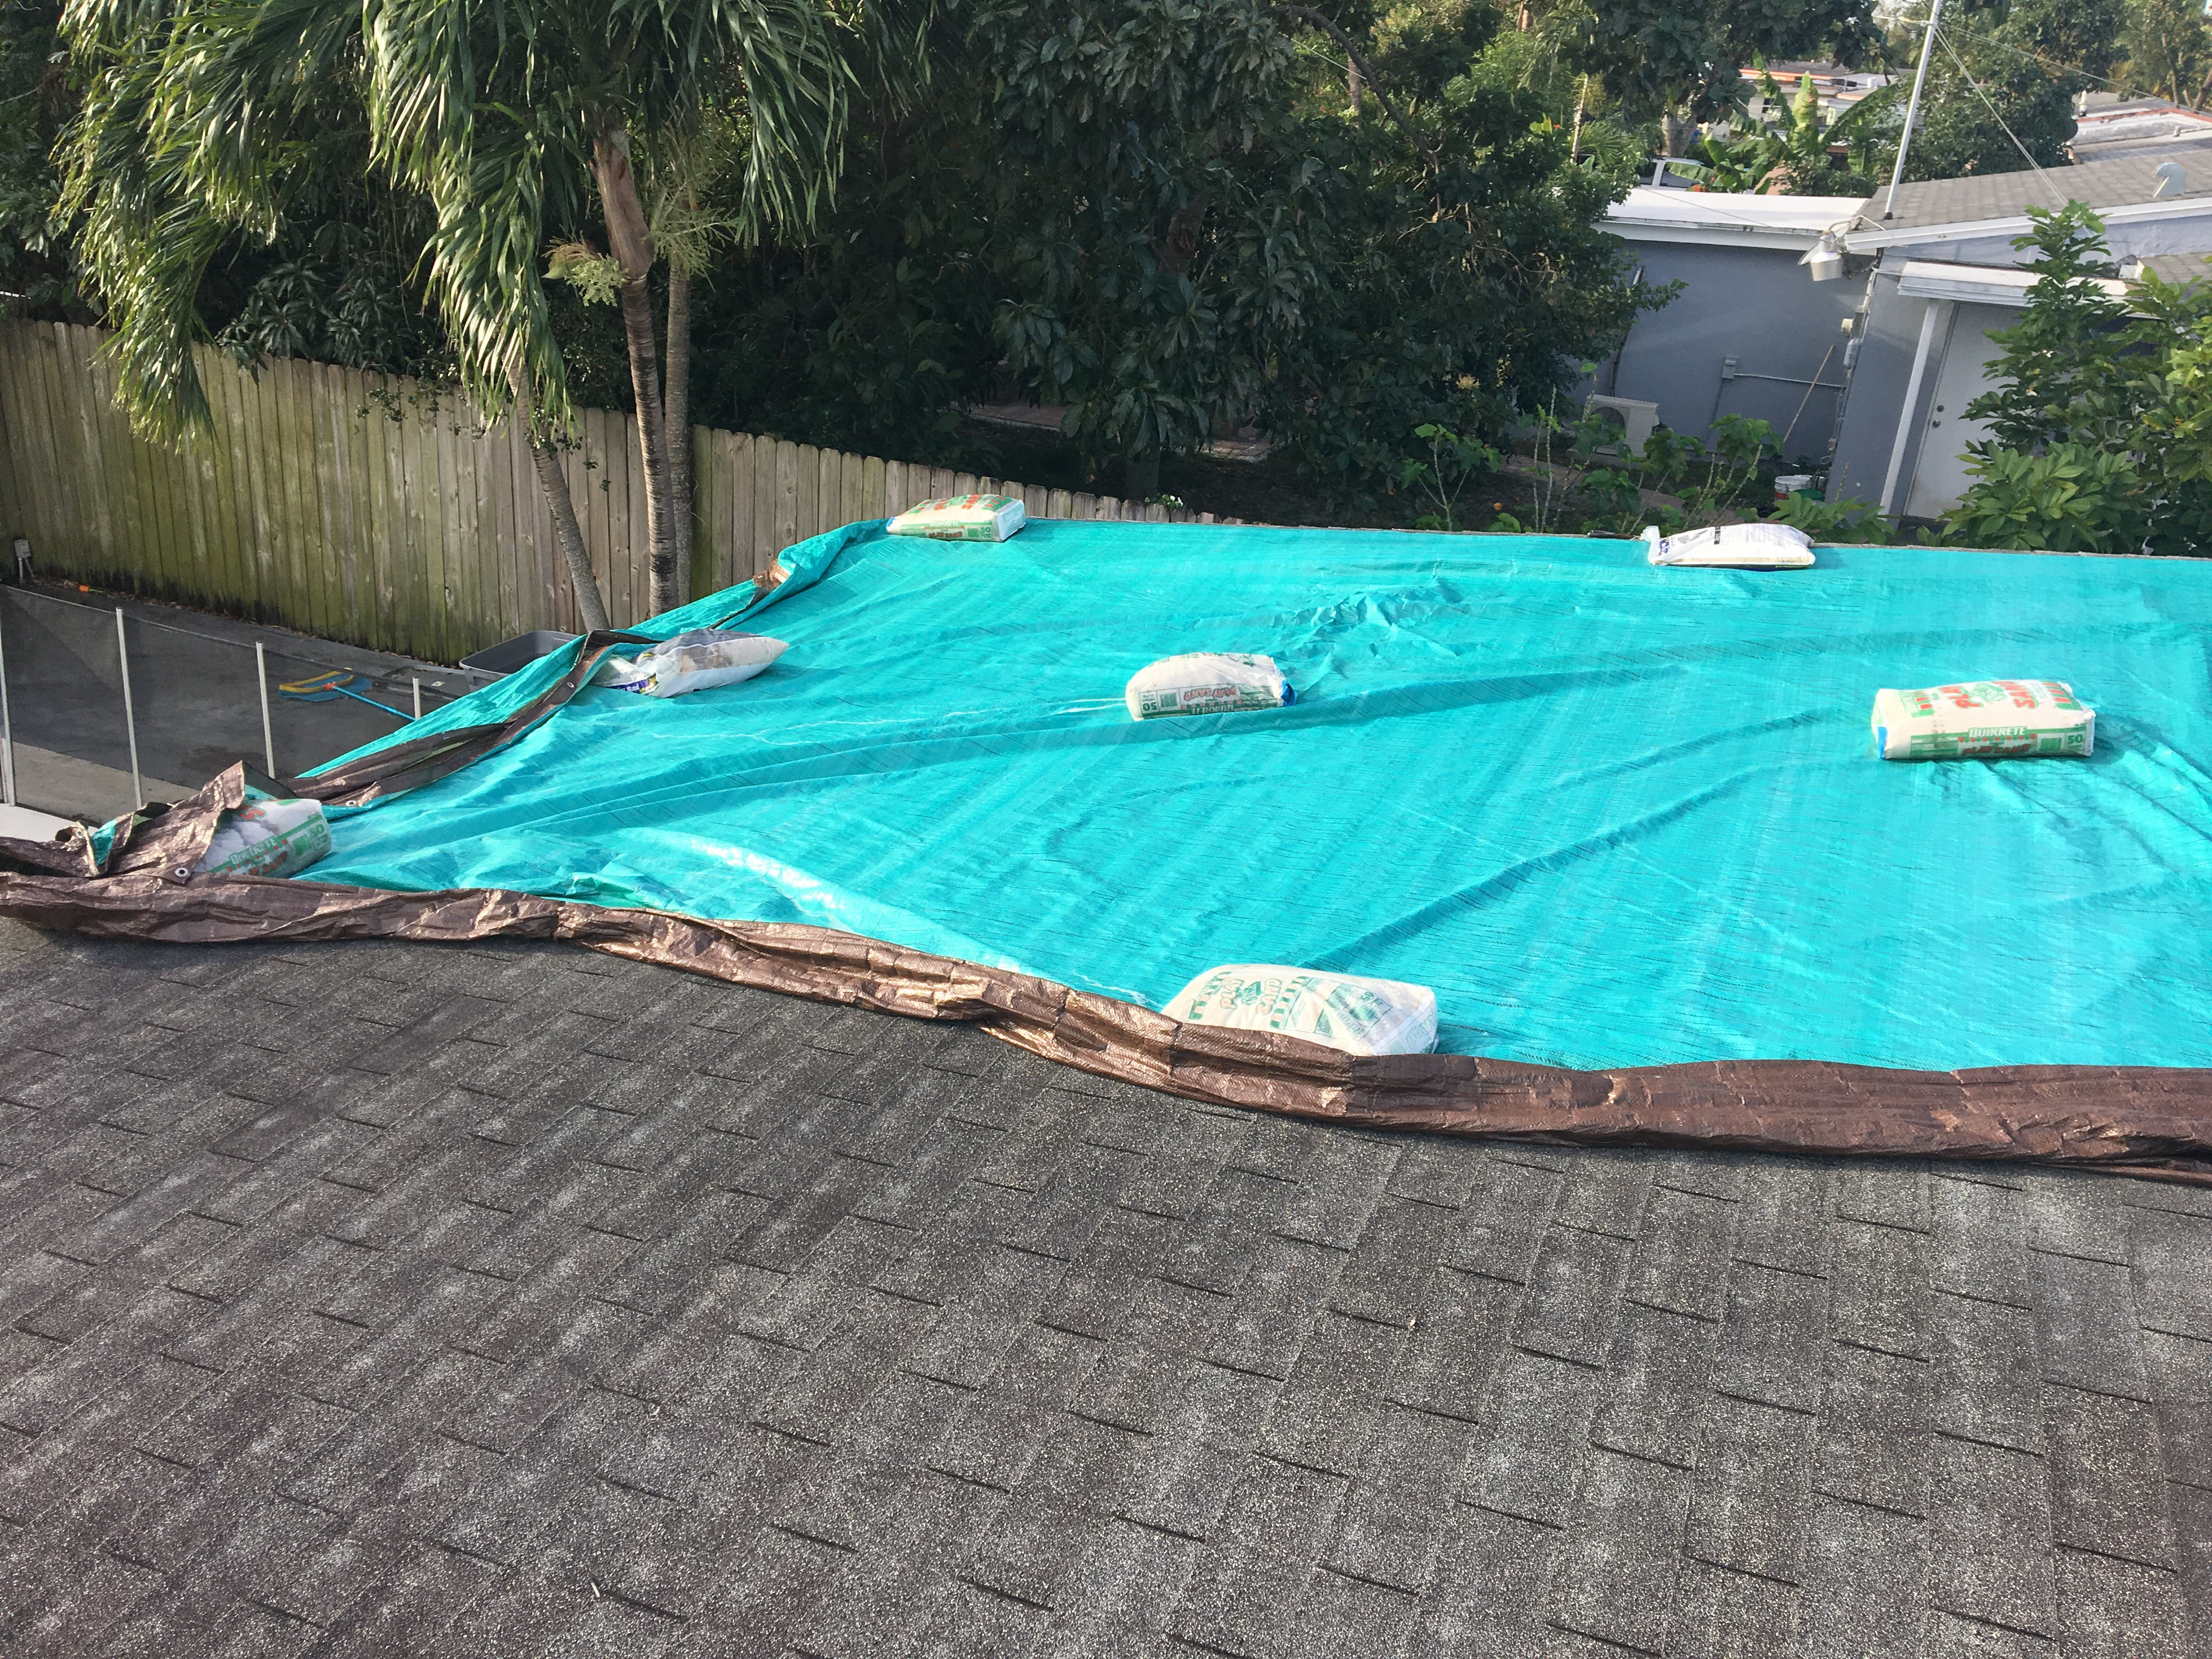 EE&G Restoration Orlando Water Damage, Fire Damage, Mold Remediation & Removal image 11